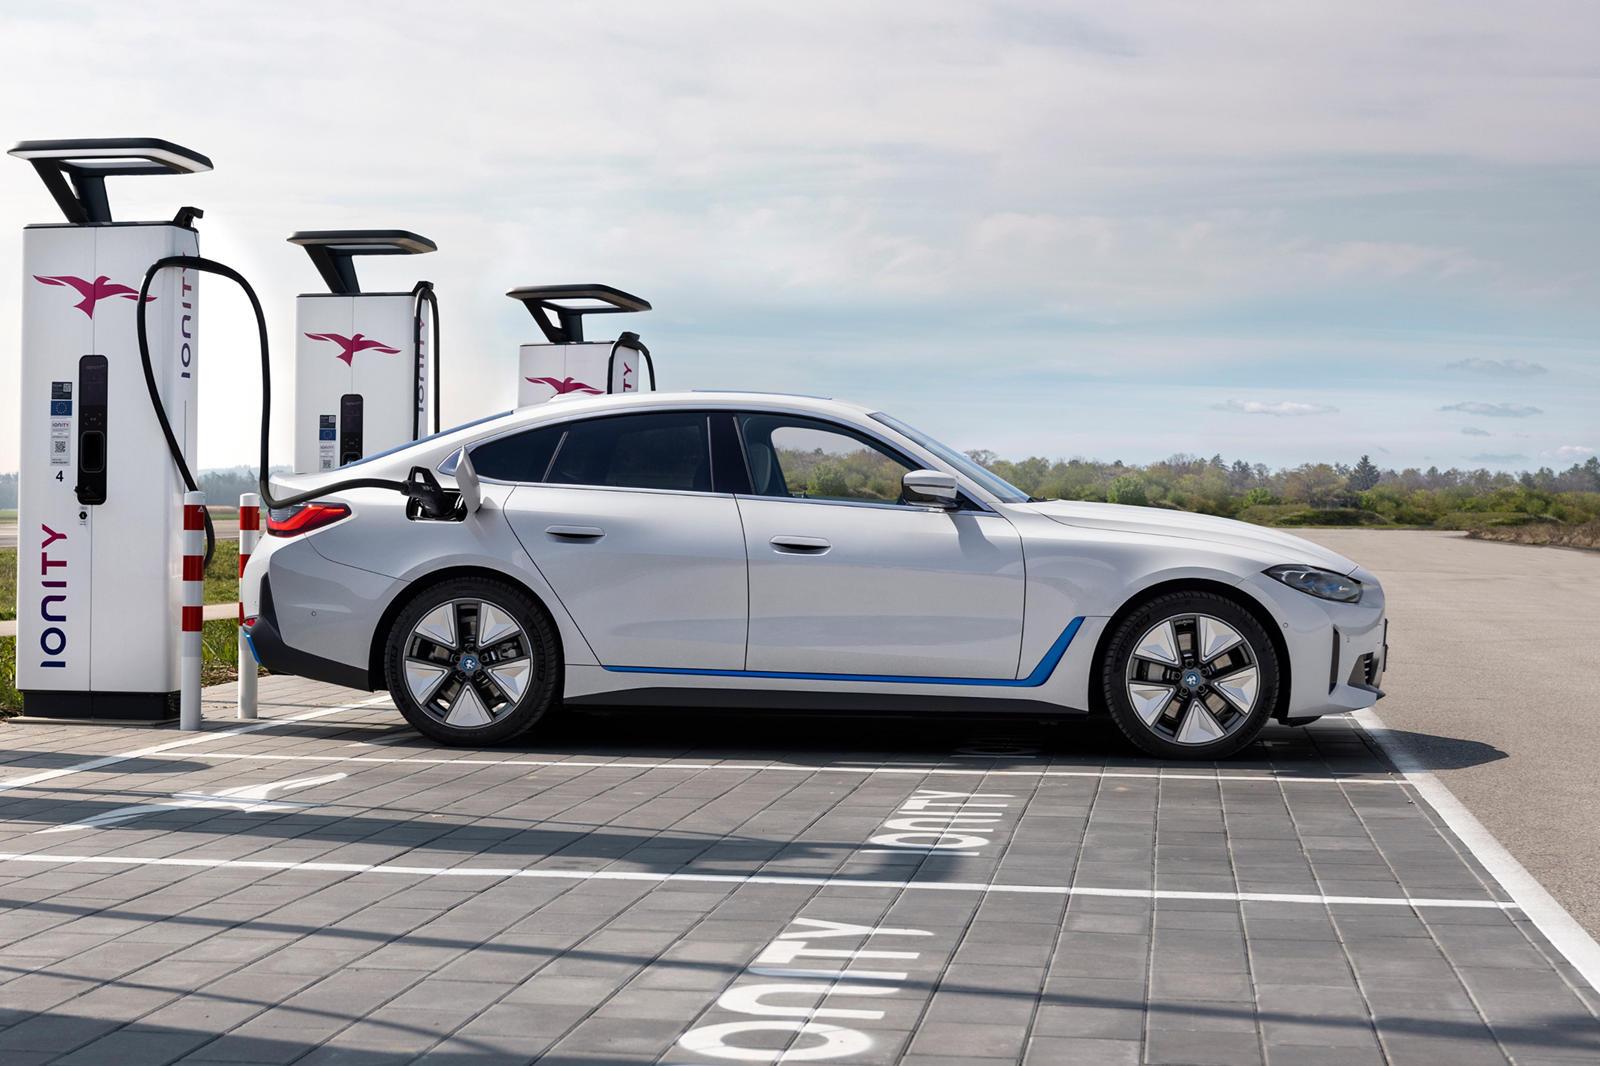 Biden Wants Automakers To Meet 40% EV Goal By 2030